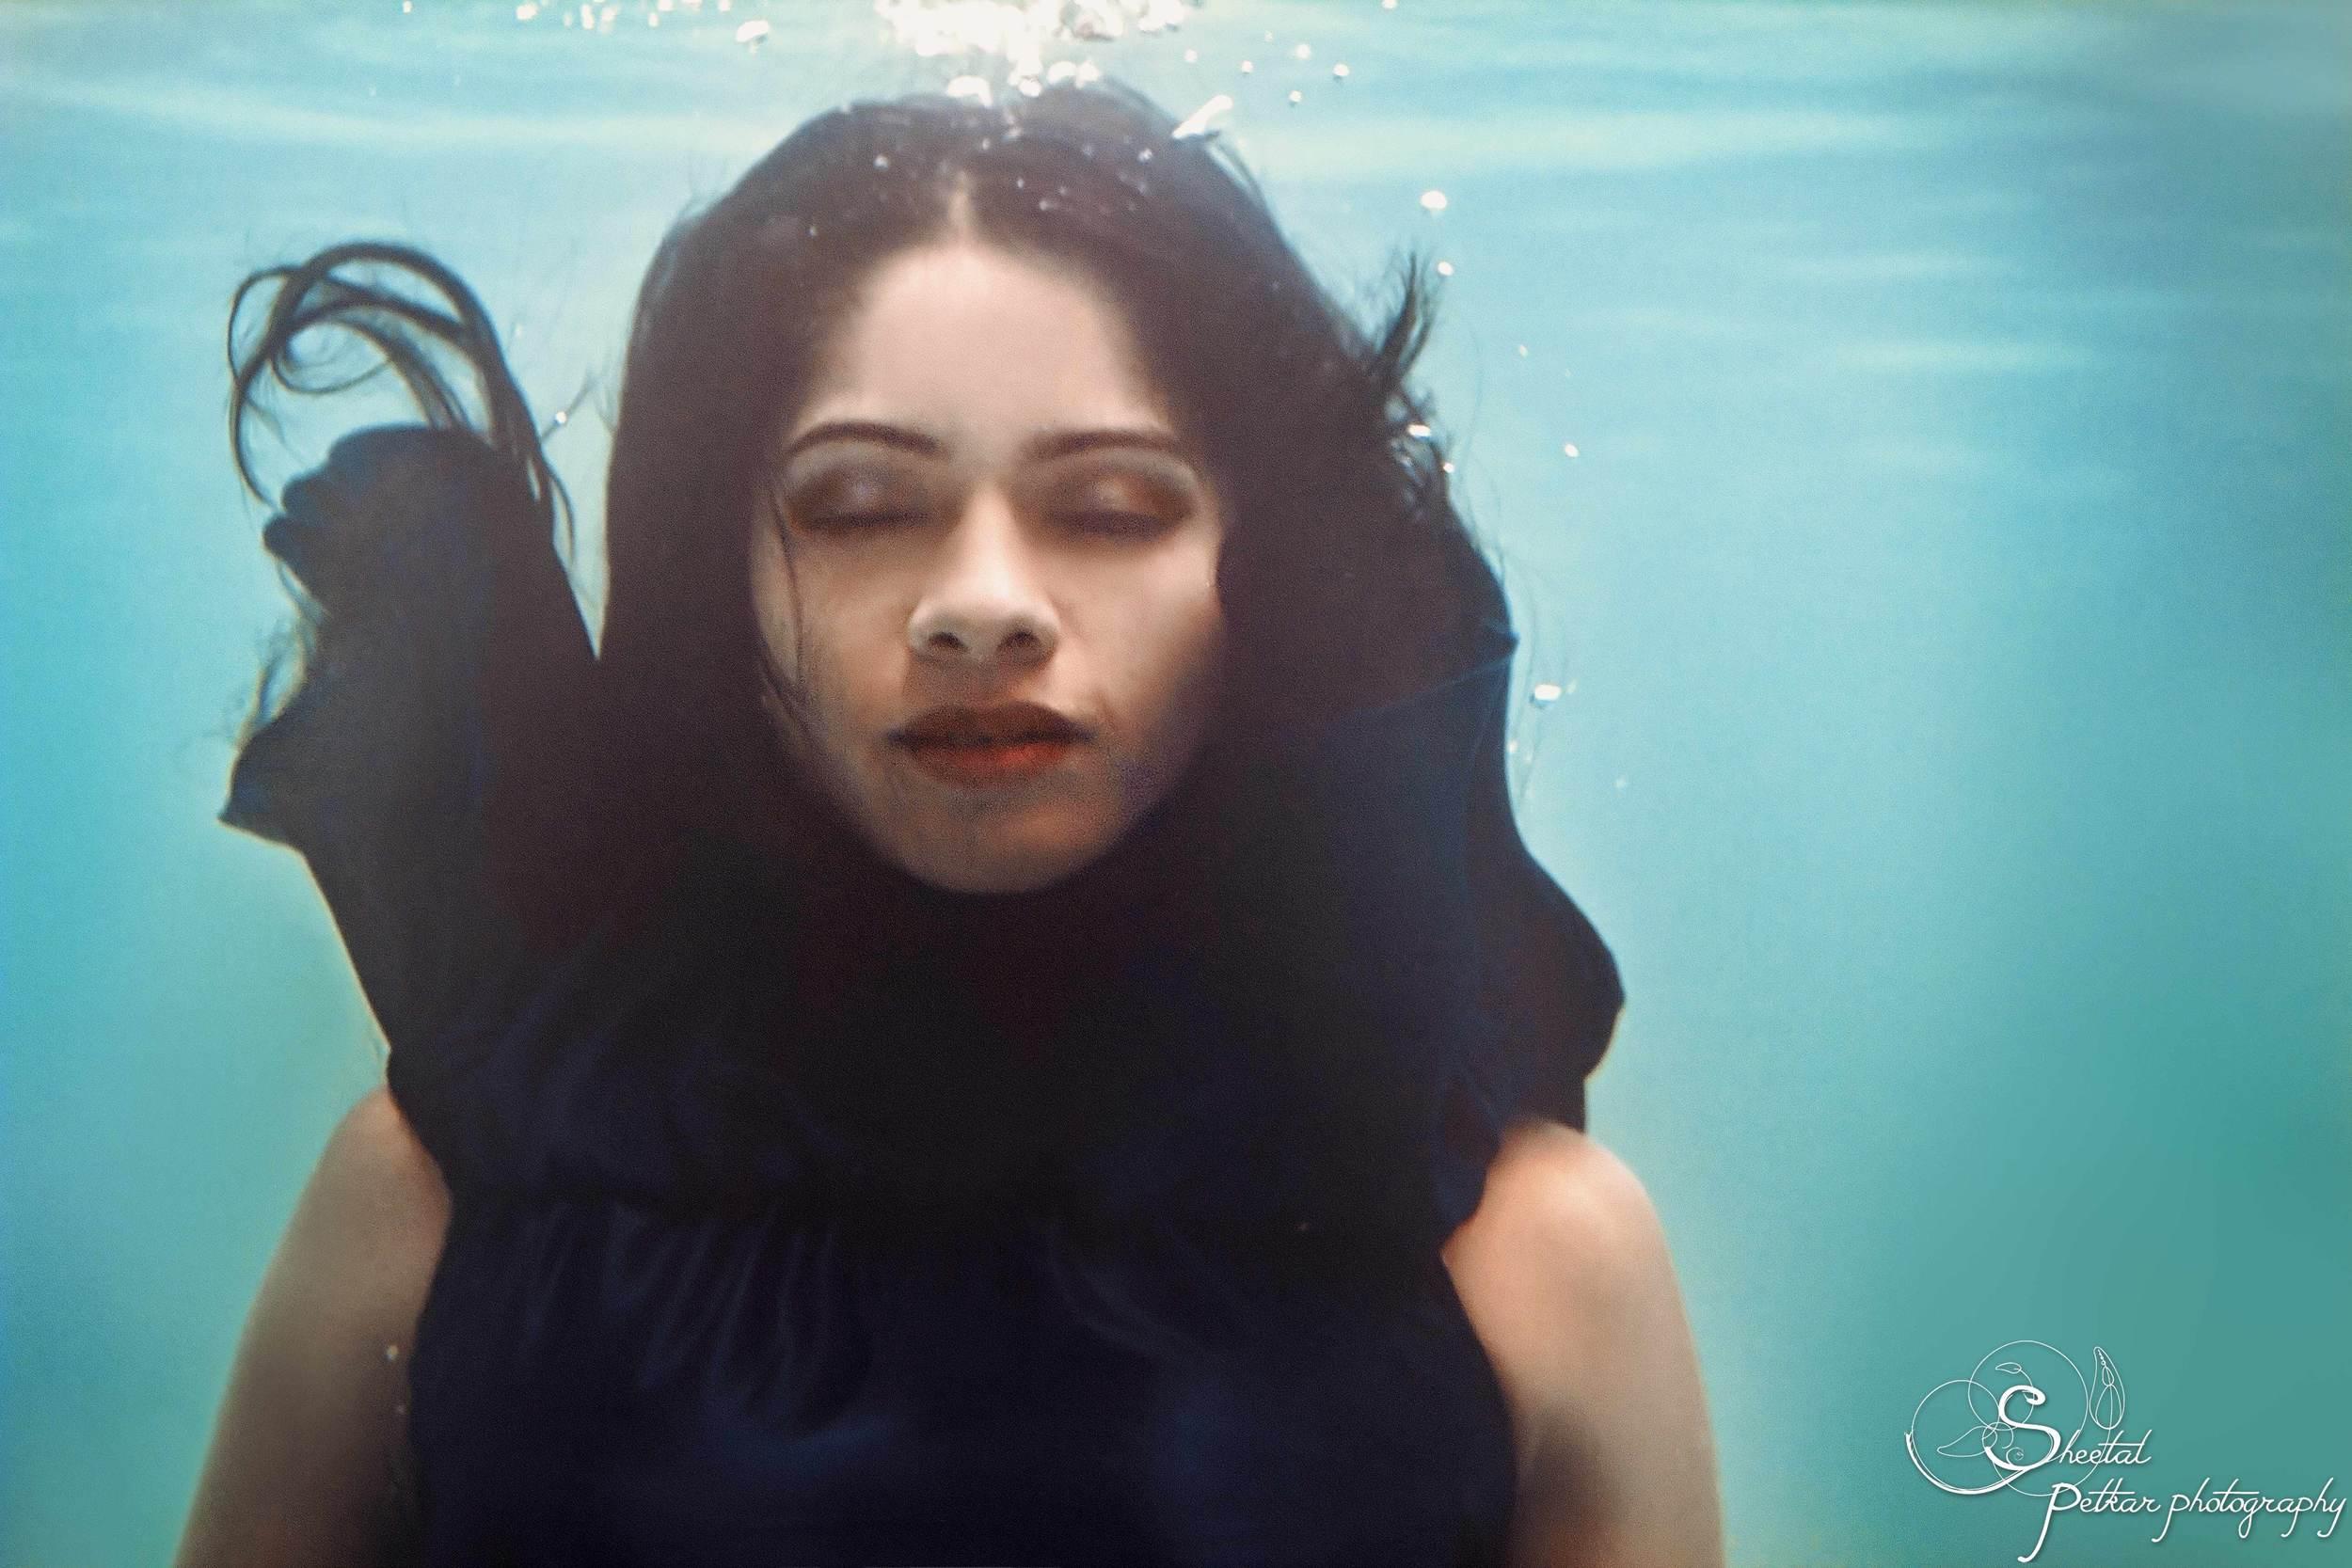 surreal_underwater_portrait_of_a_girl.jpg